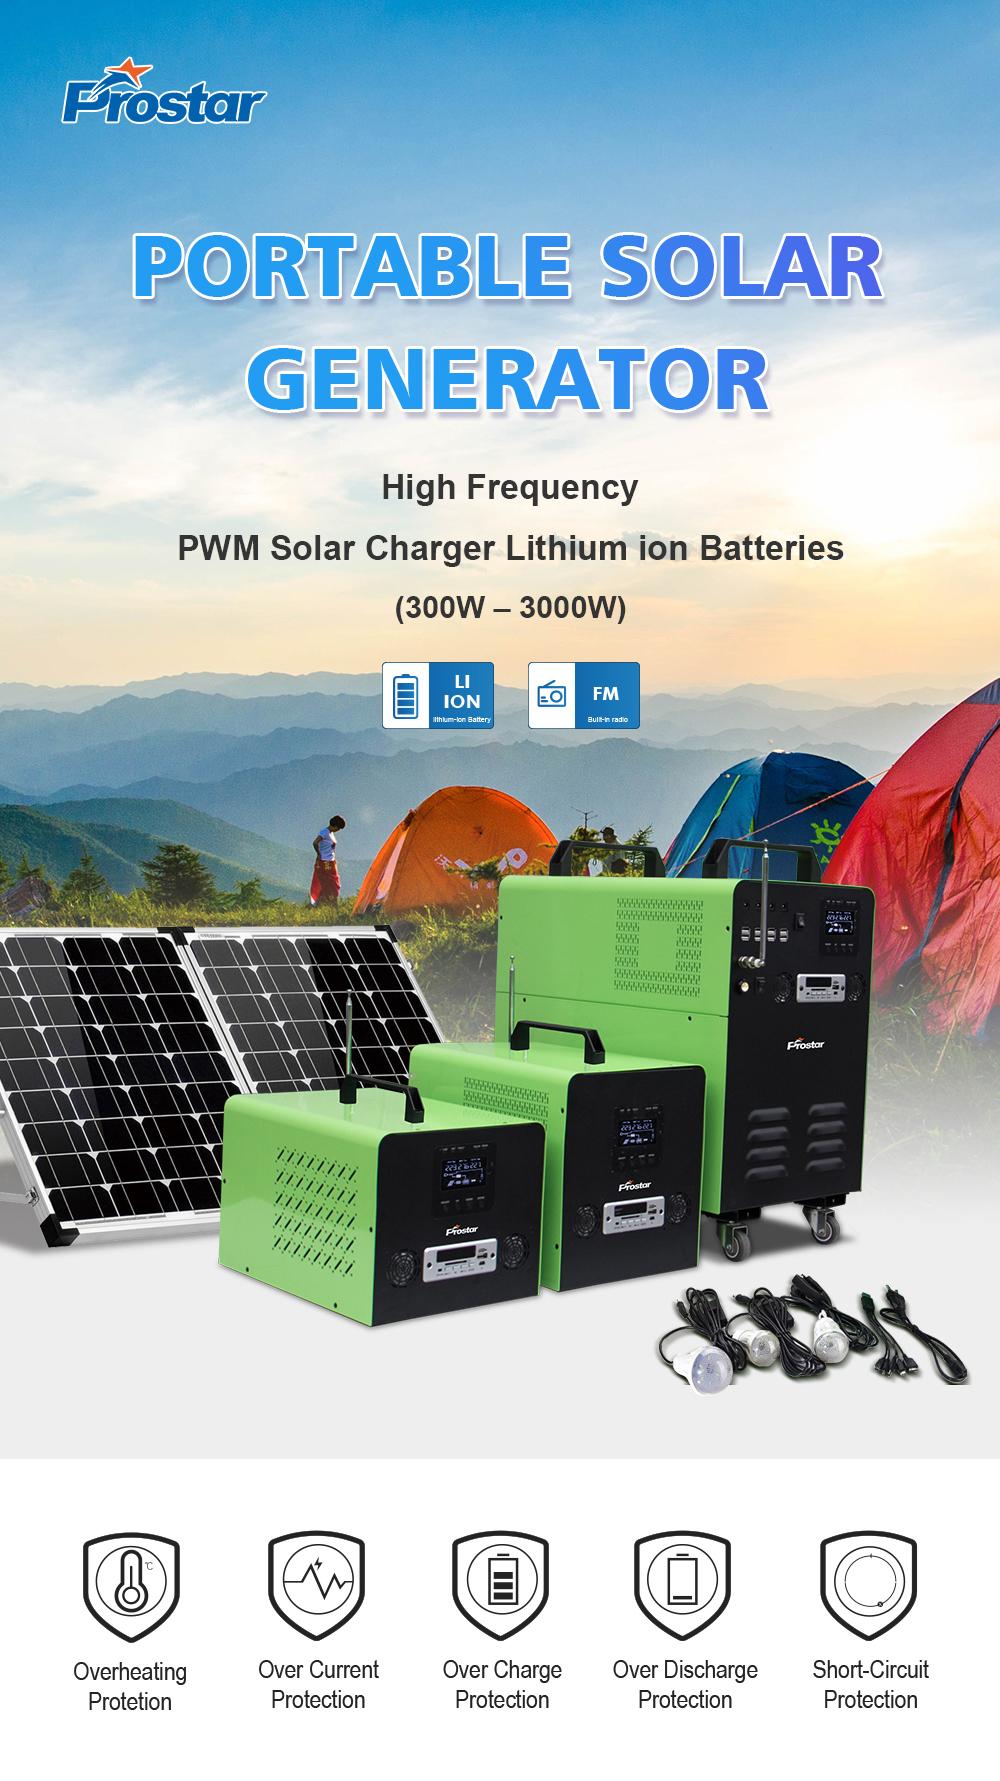 PWM Solar Charger Portable Solar Generator